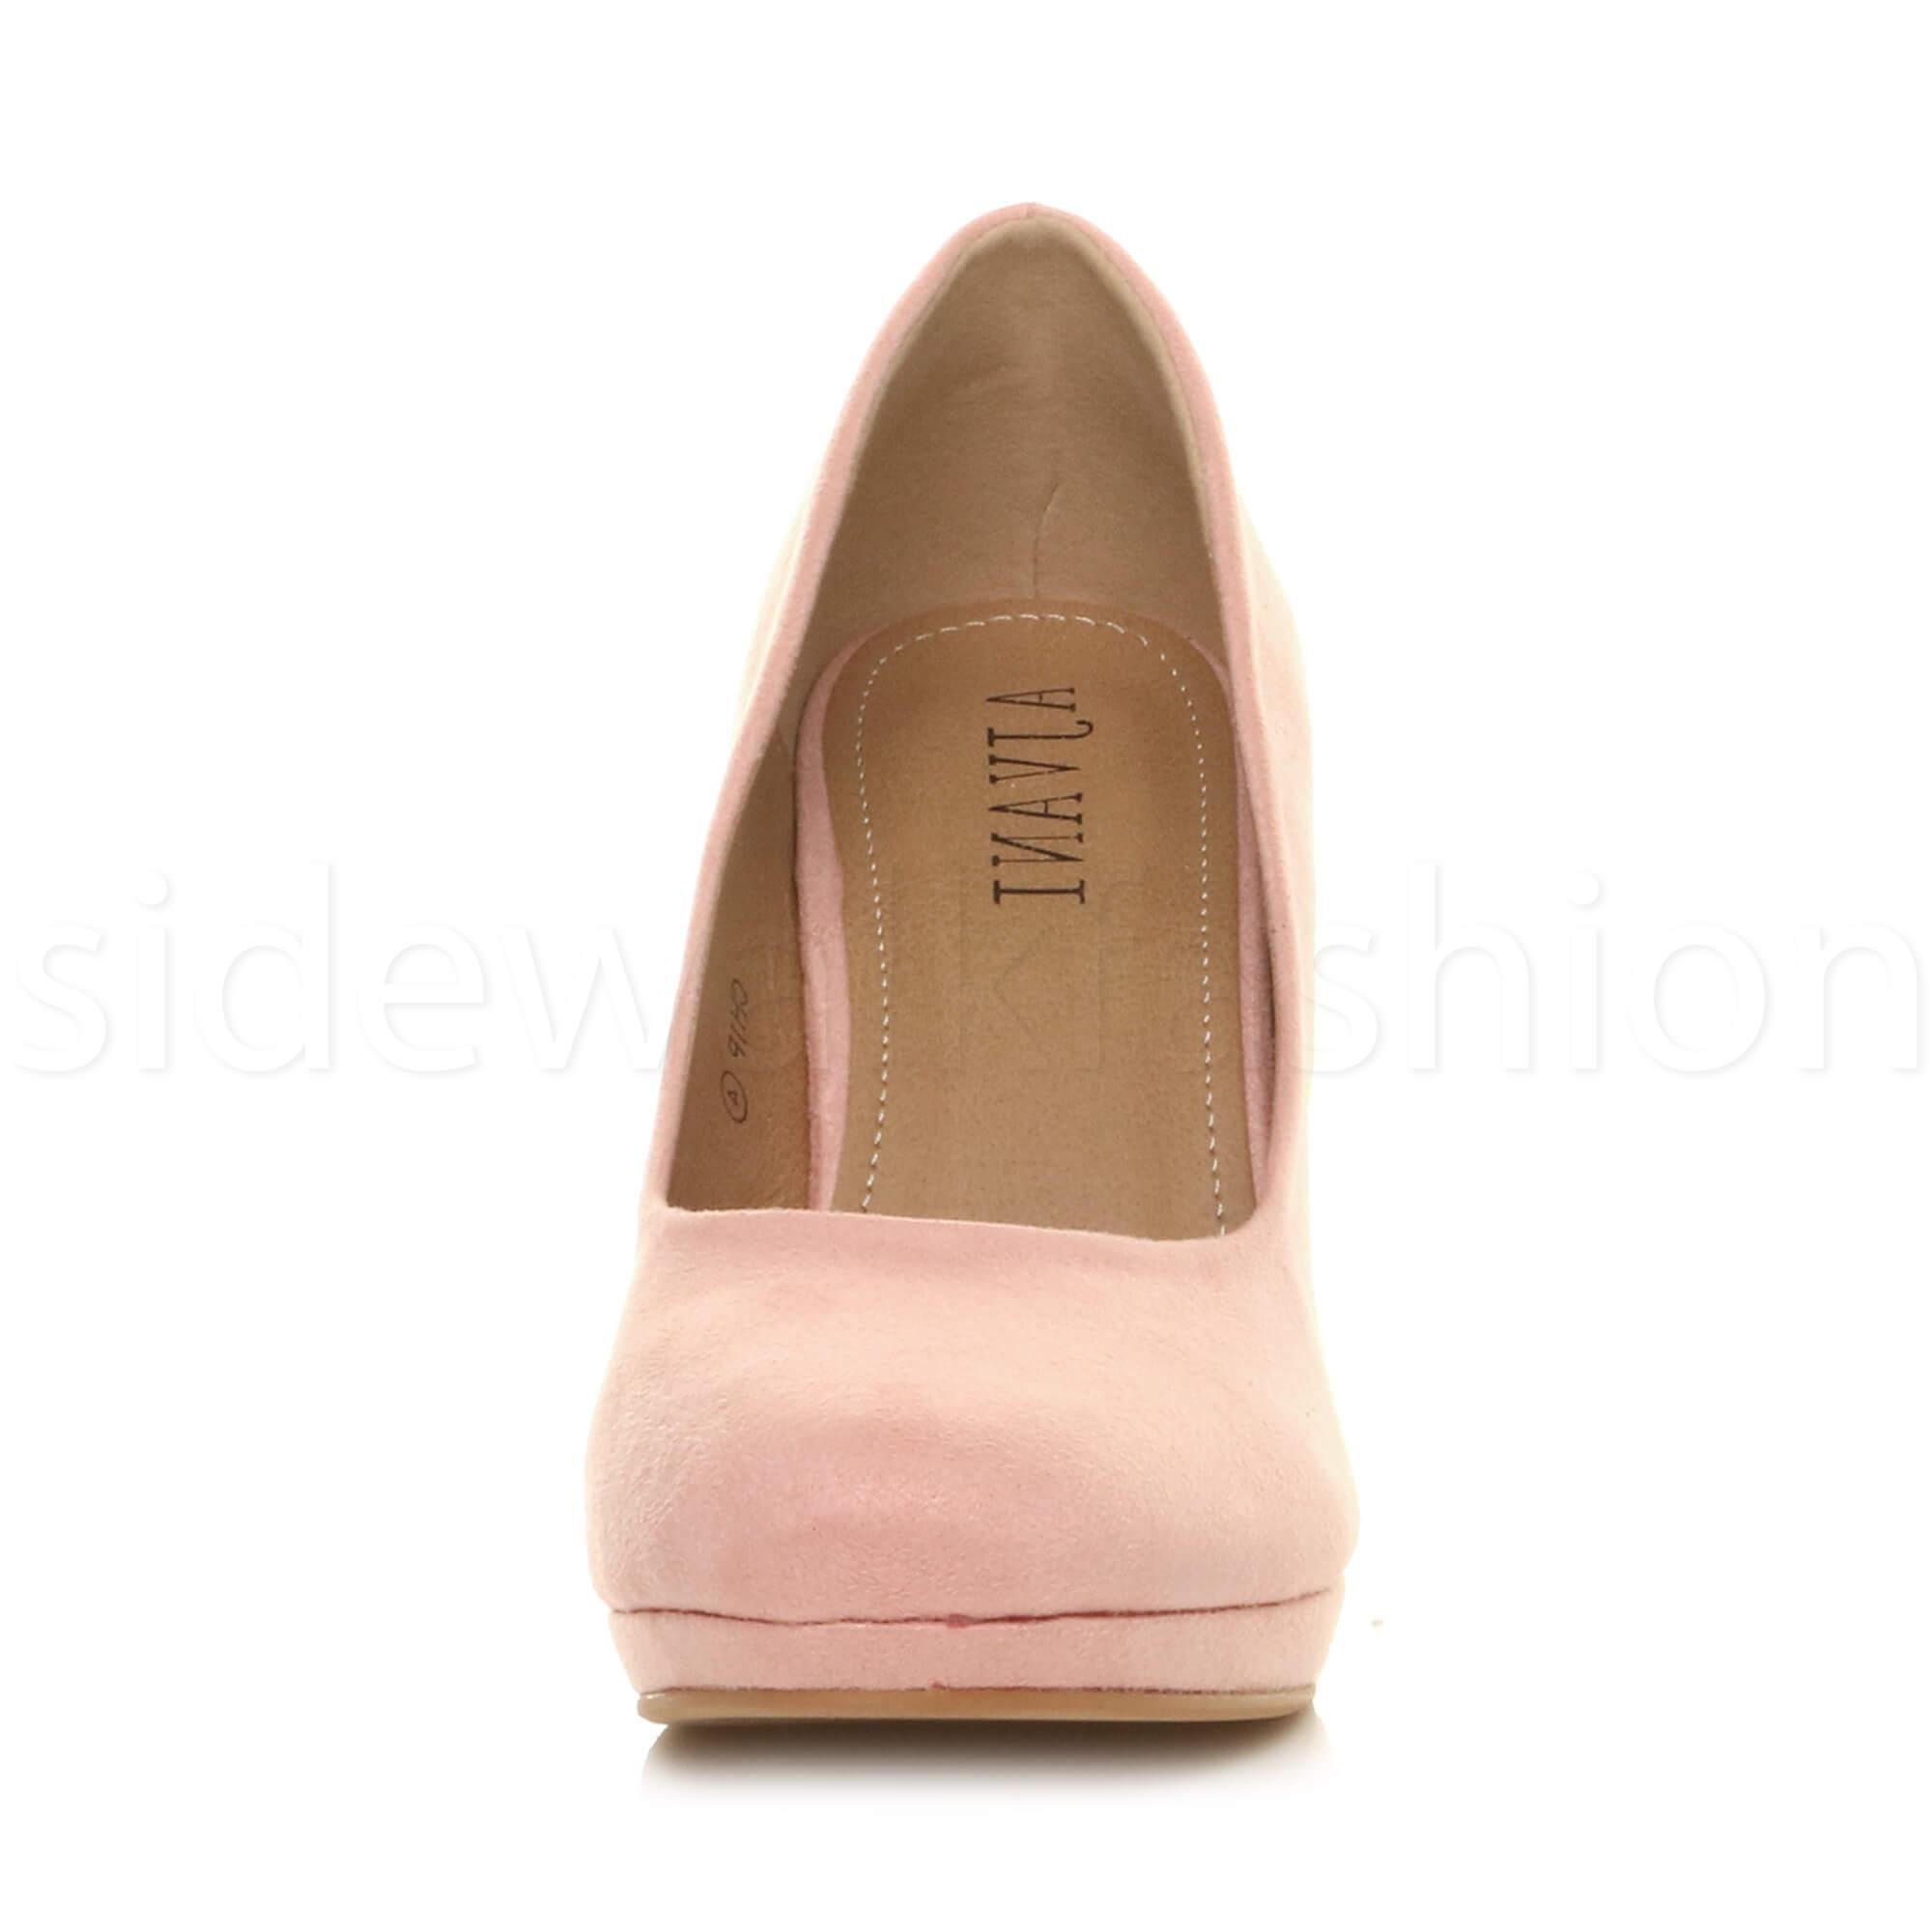 Womens-ladies-high-mid-heel-platform-wedding-evening-bridesmaid-court-shoes-size thumbnail 6